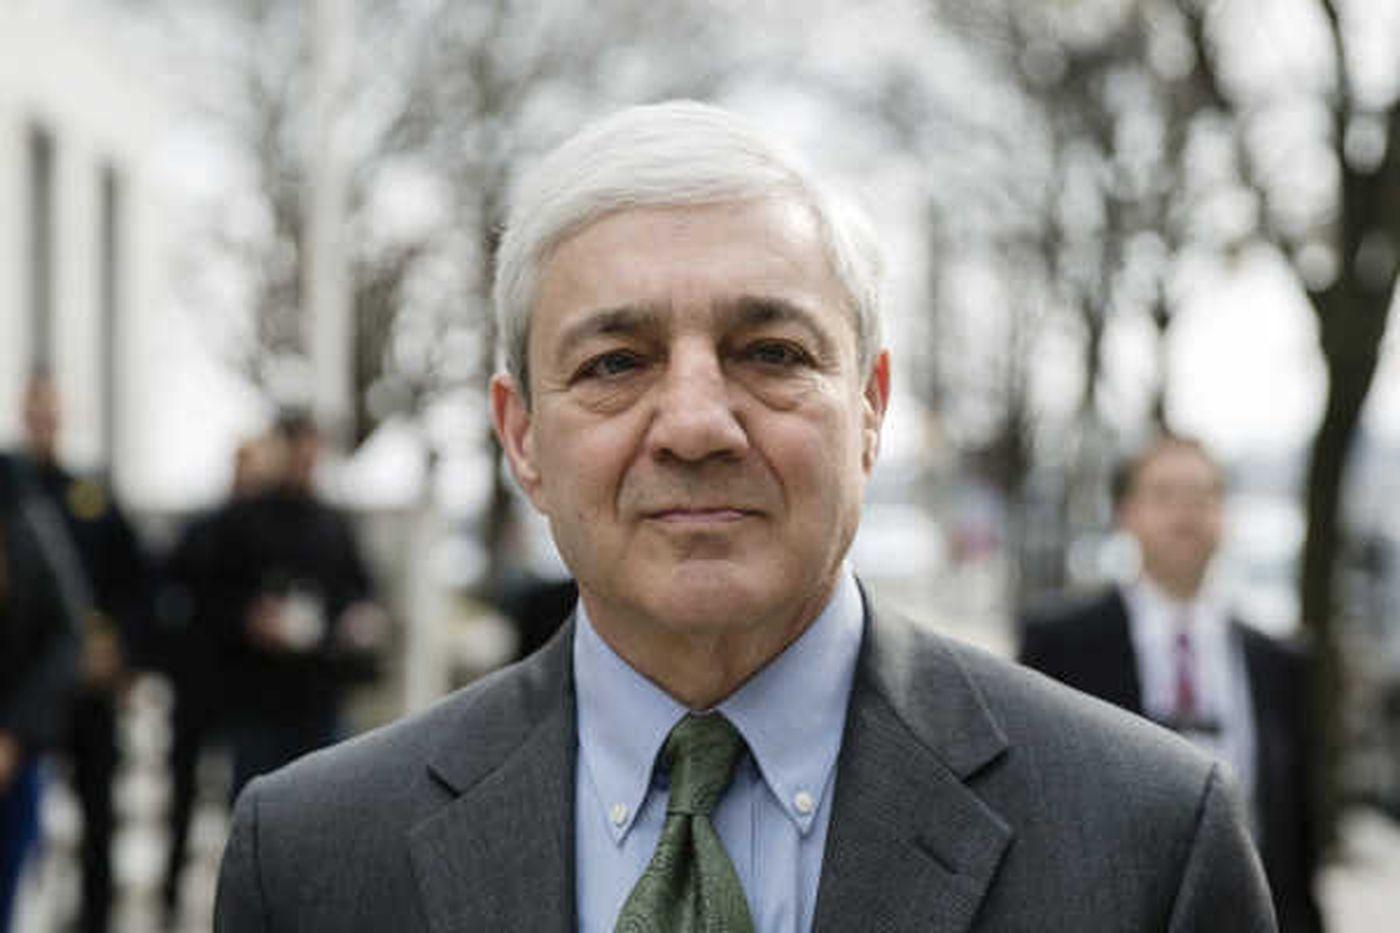 Jury foreman calls guilty verdict against Spanier a 'mistake'